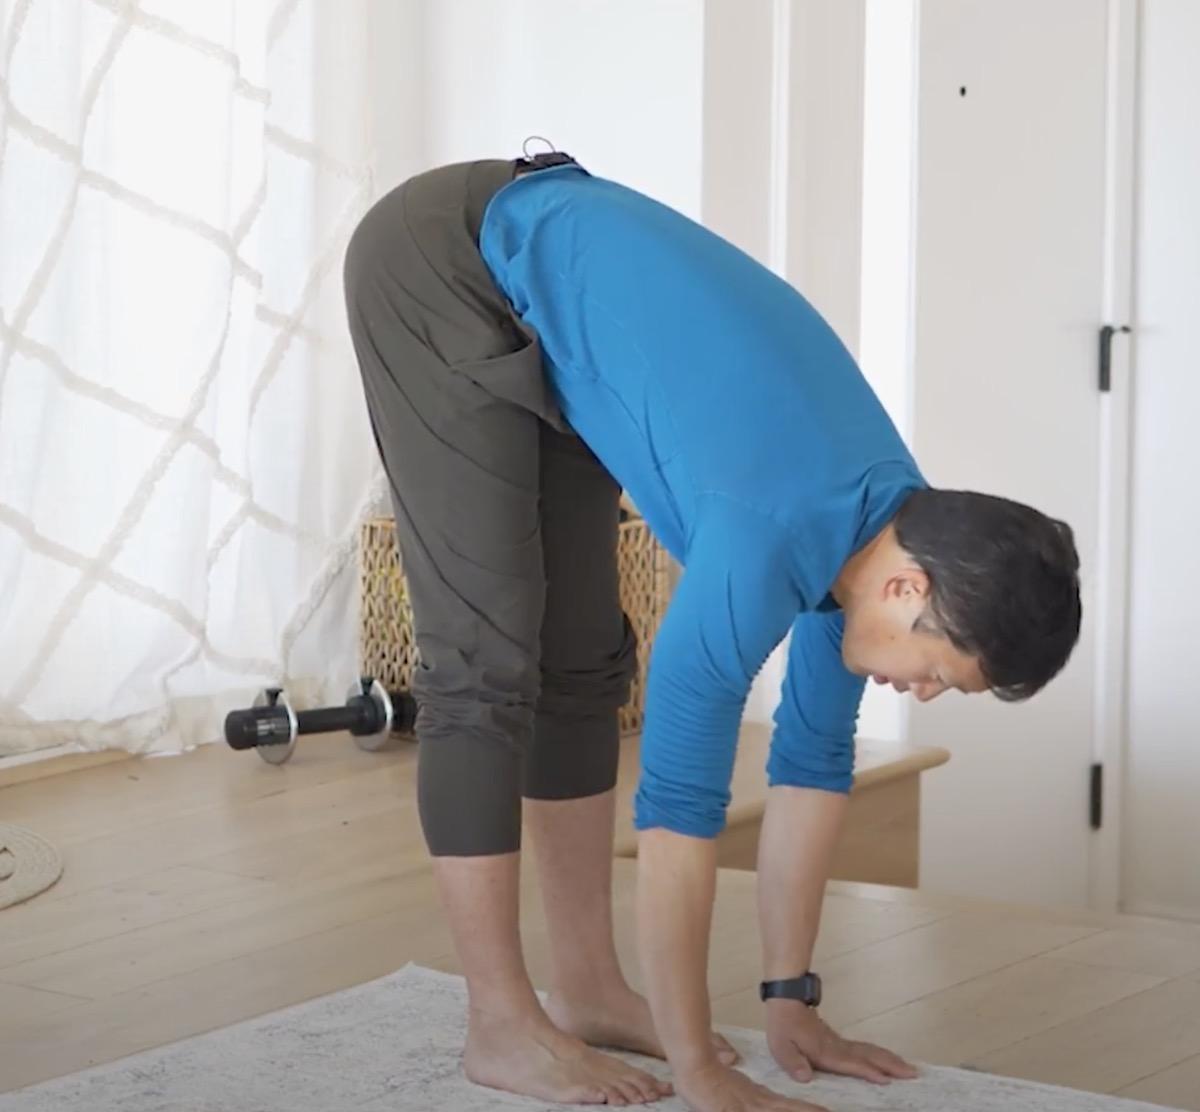 flexible man touching the floor